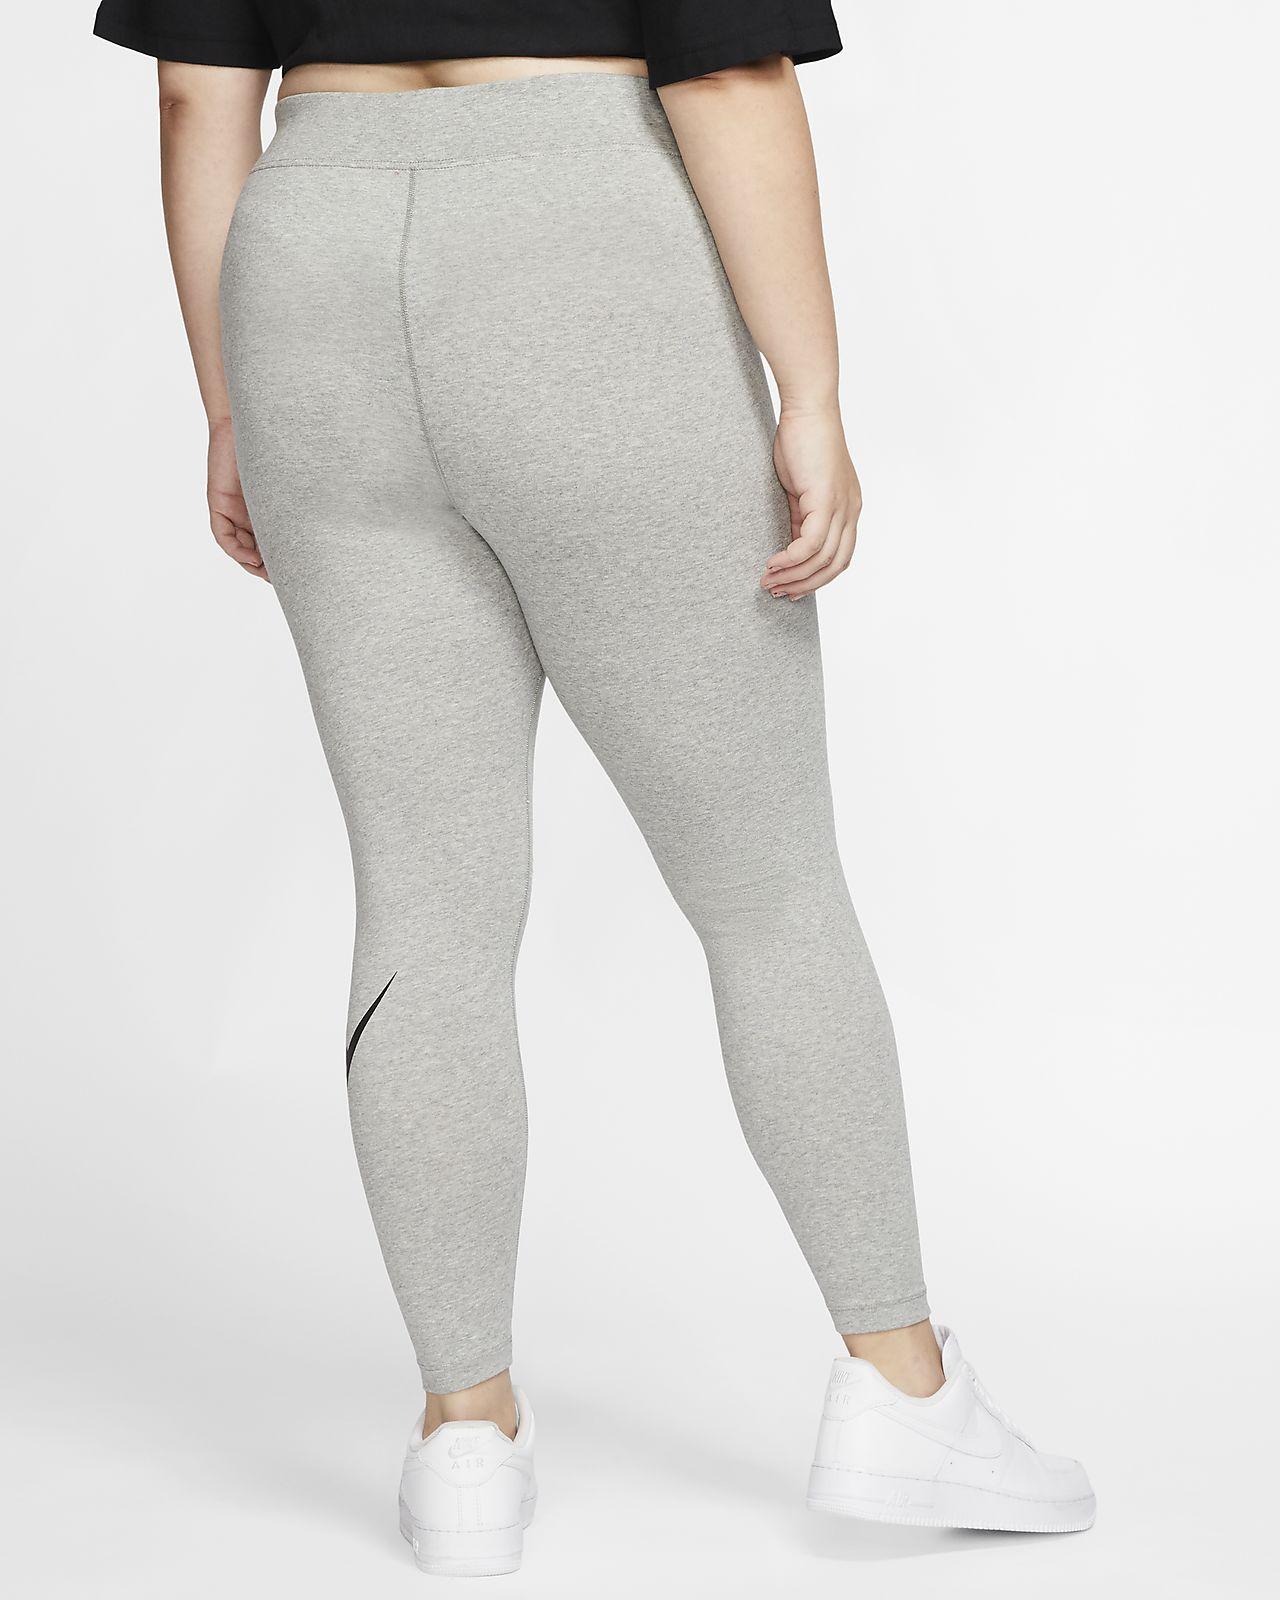 Legging taille haute Nike Sportswear Leg A See pour Femme (grande taille)